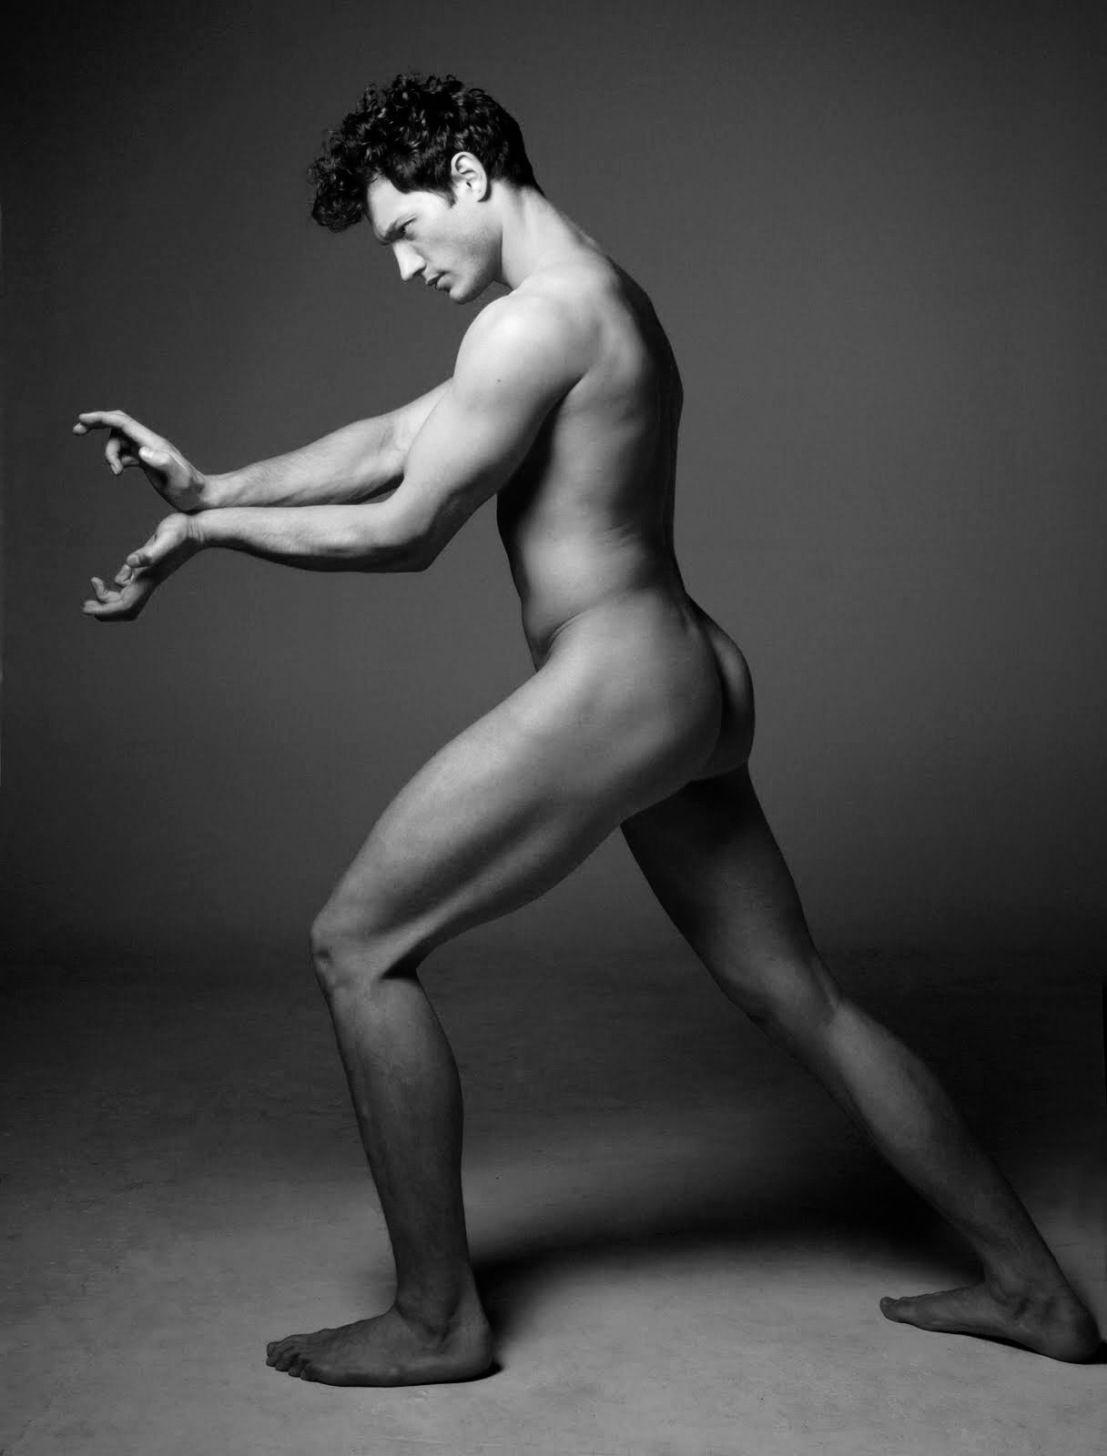 Nude girls in Estet MF pictures 19